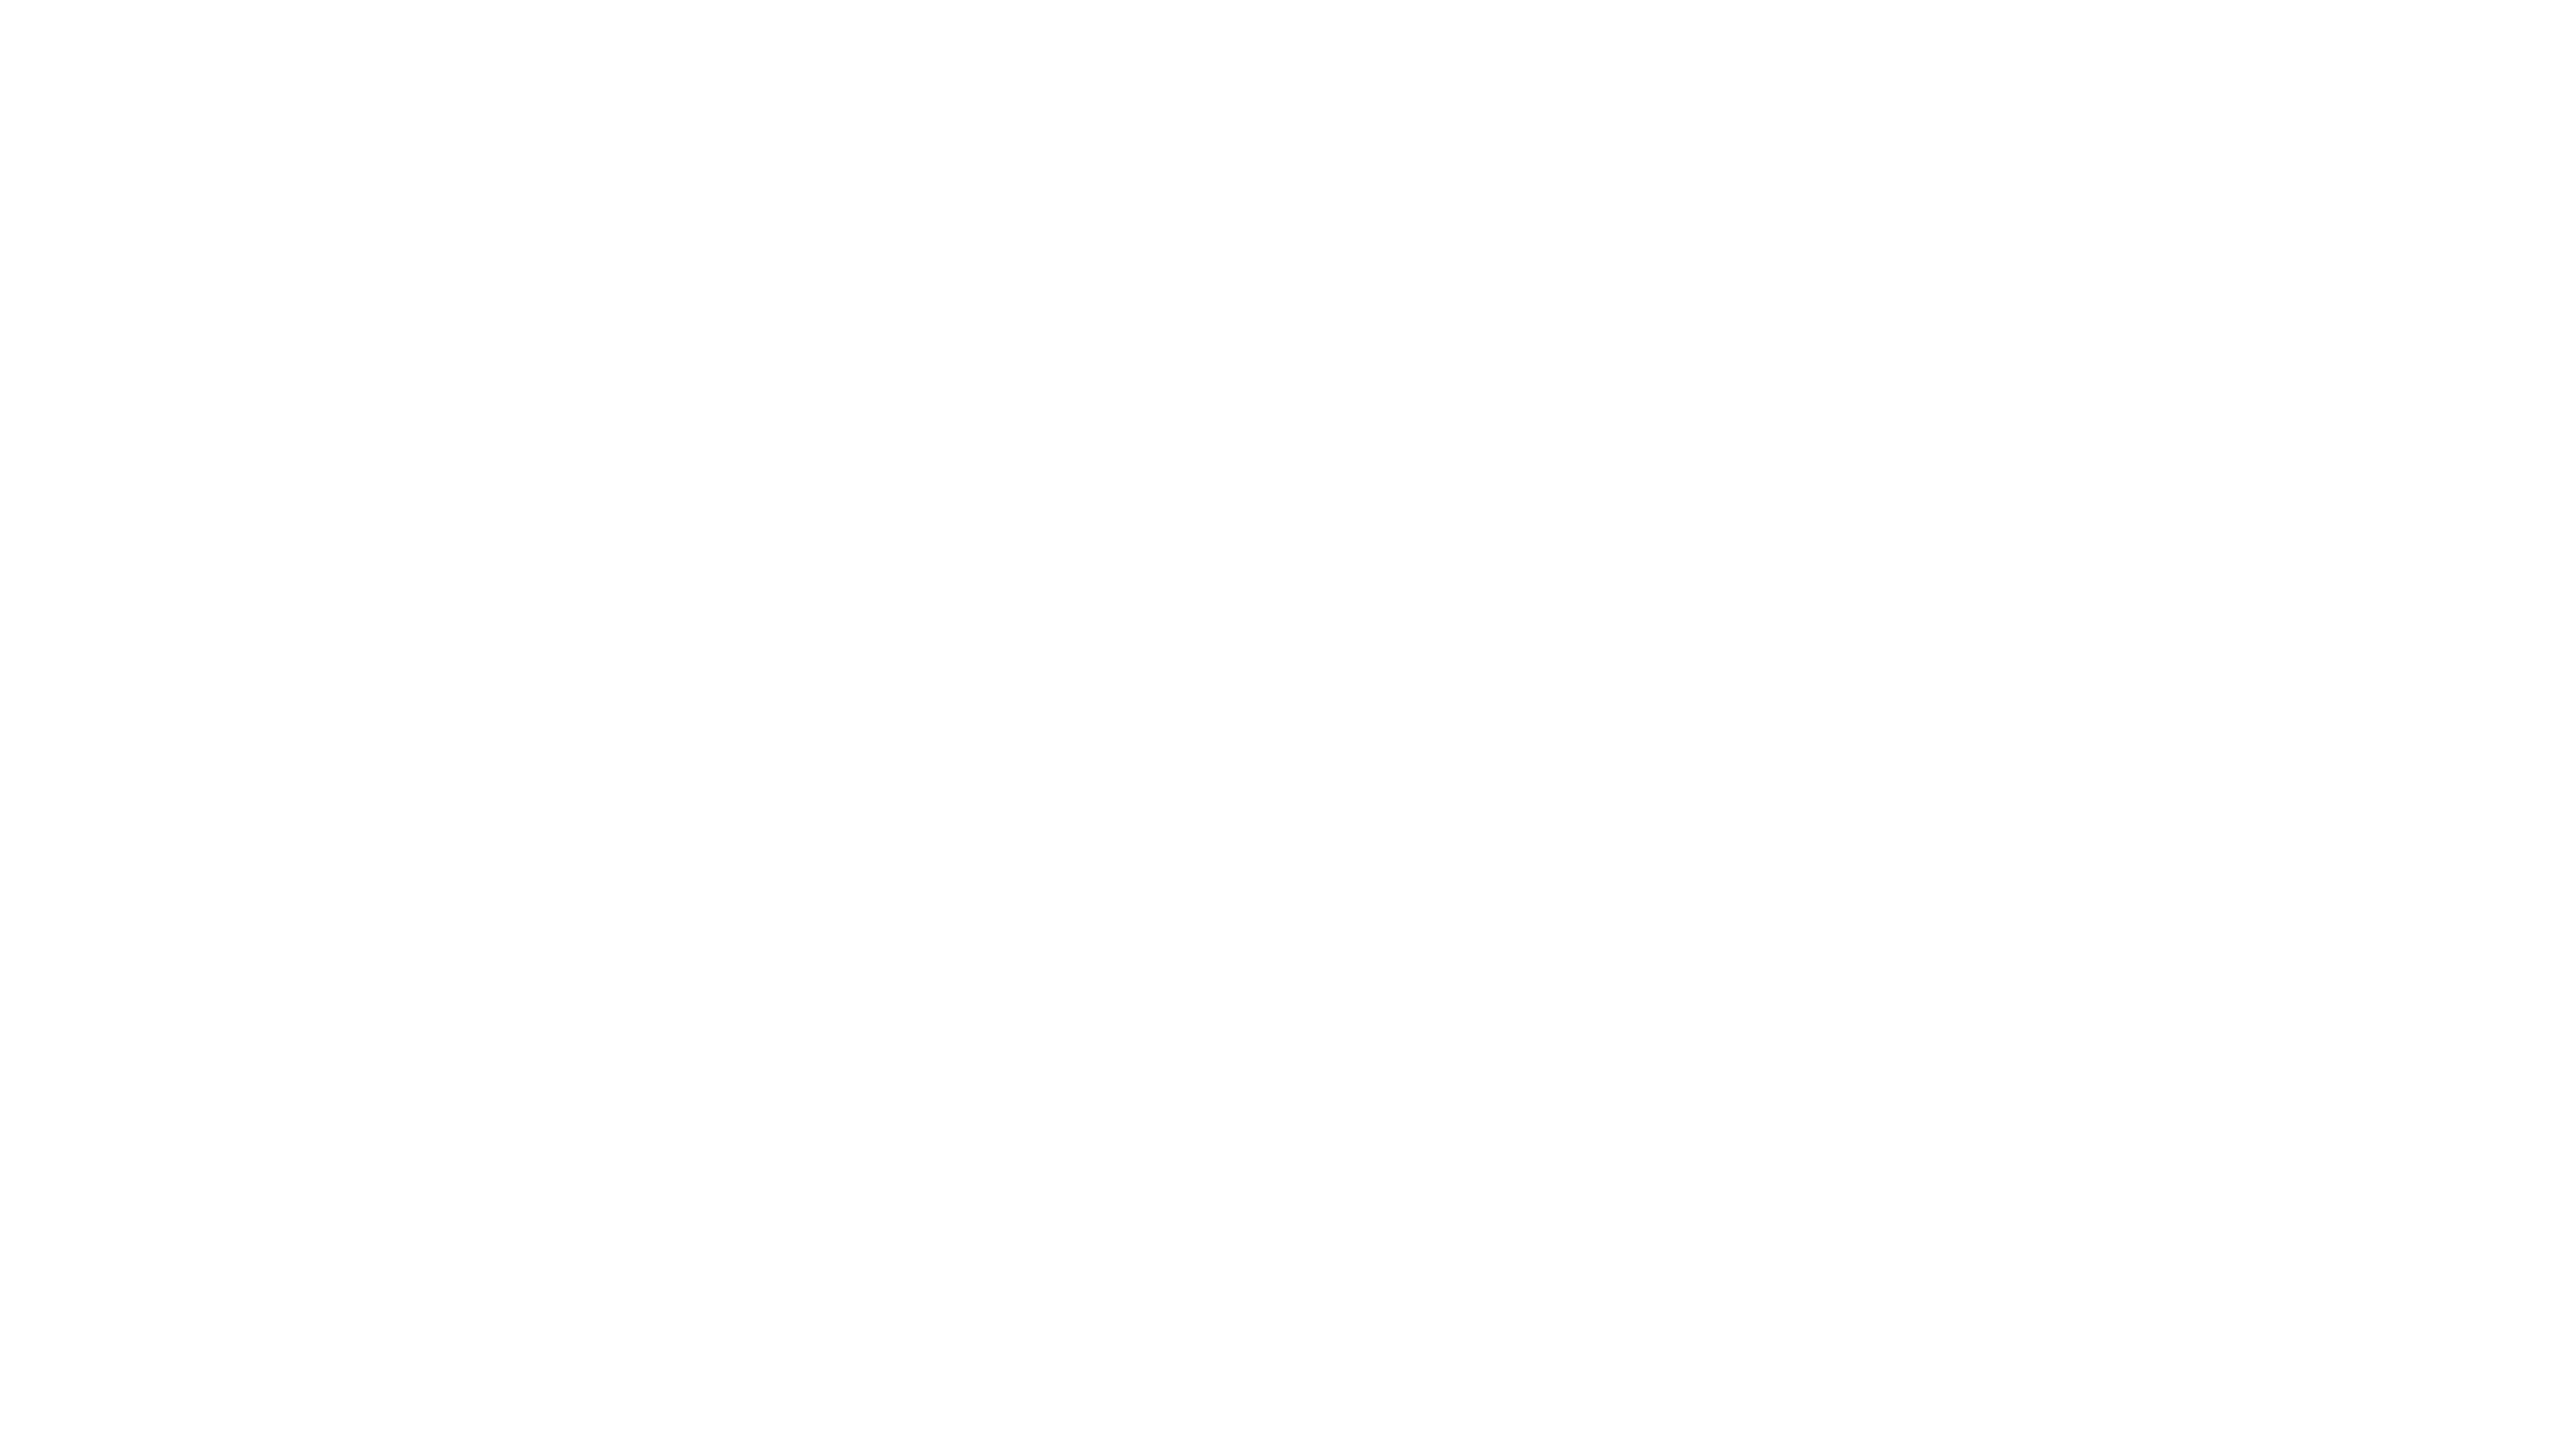 Fuller dialogues title